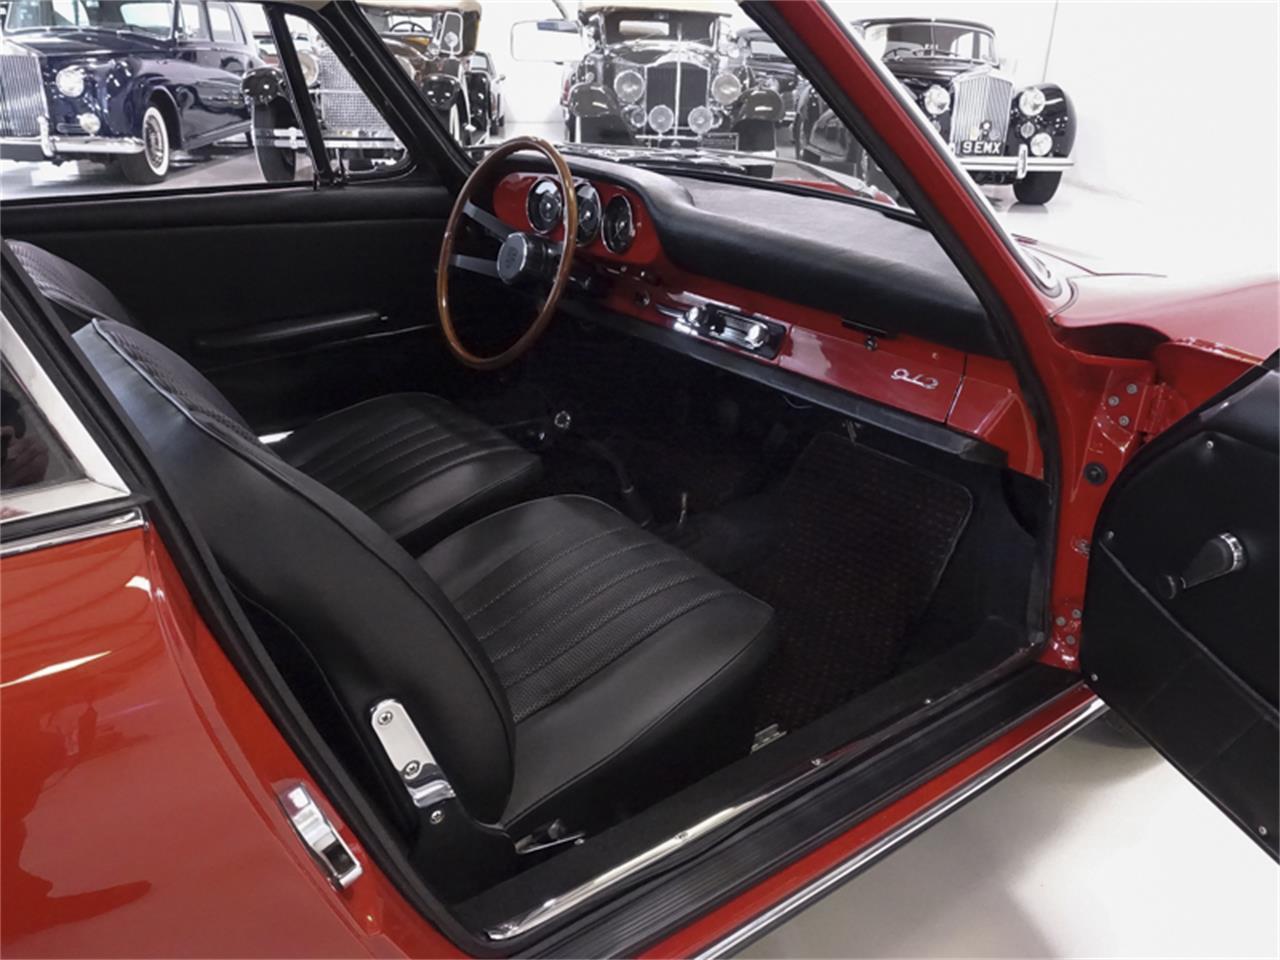 1965 Porsche 912 (CC-1193274) for sale in St. Louis, Missouri